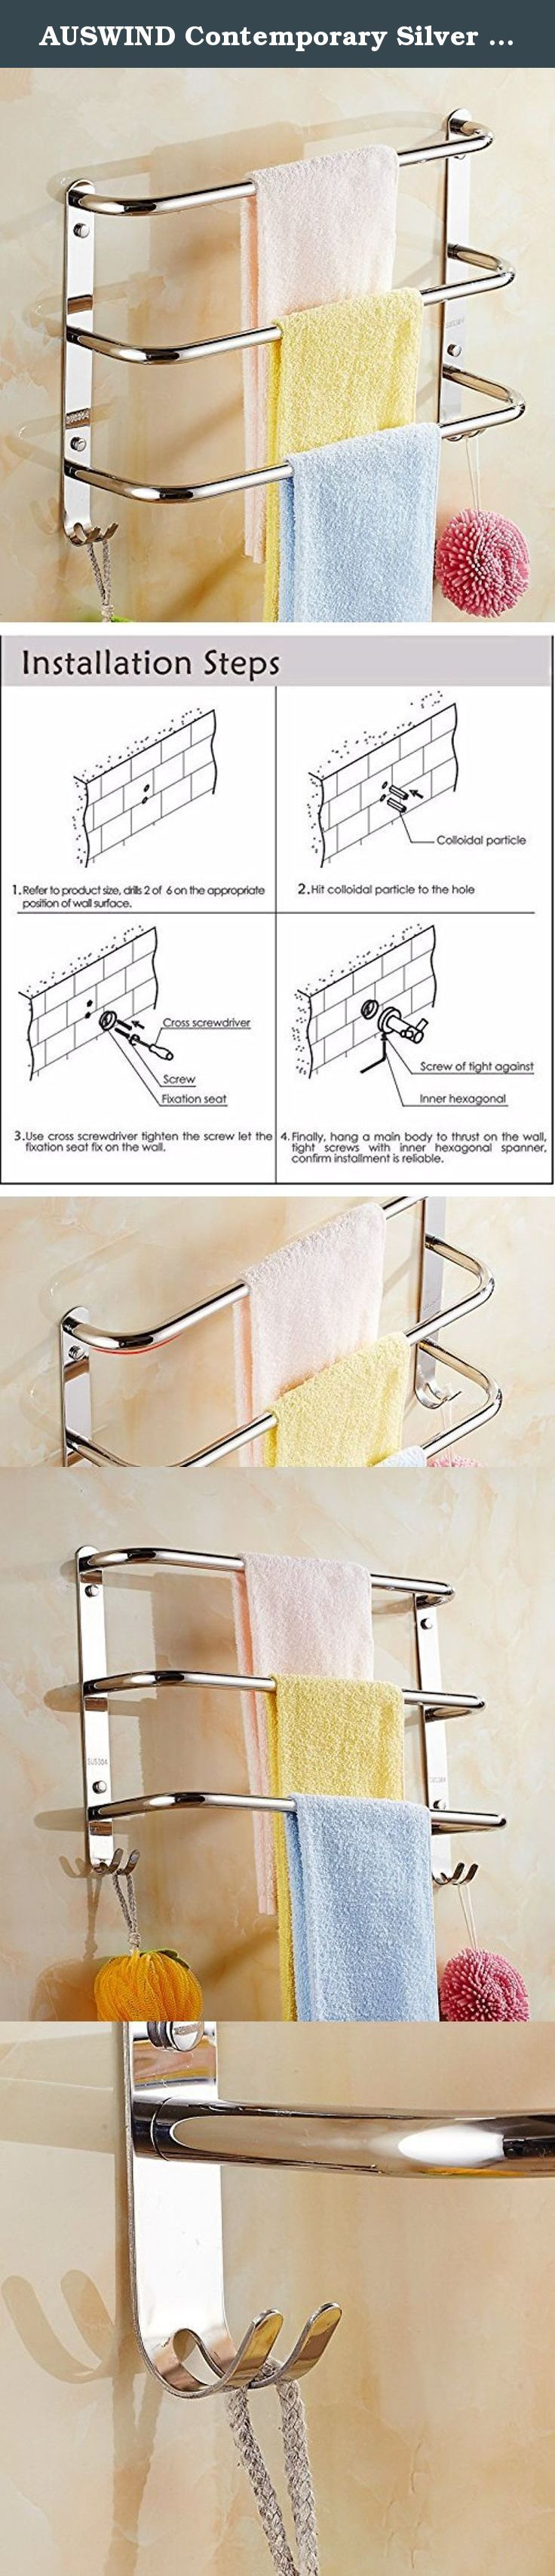 17 Best Ideas About Towel Shelf On Pinterest Elegant